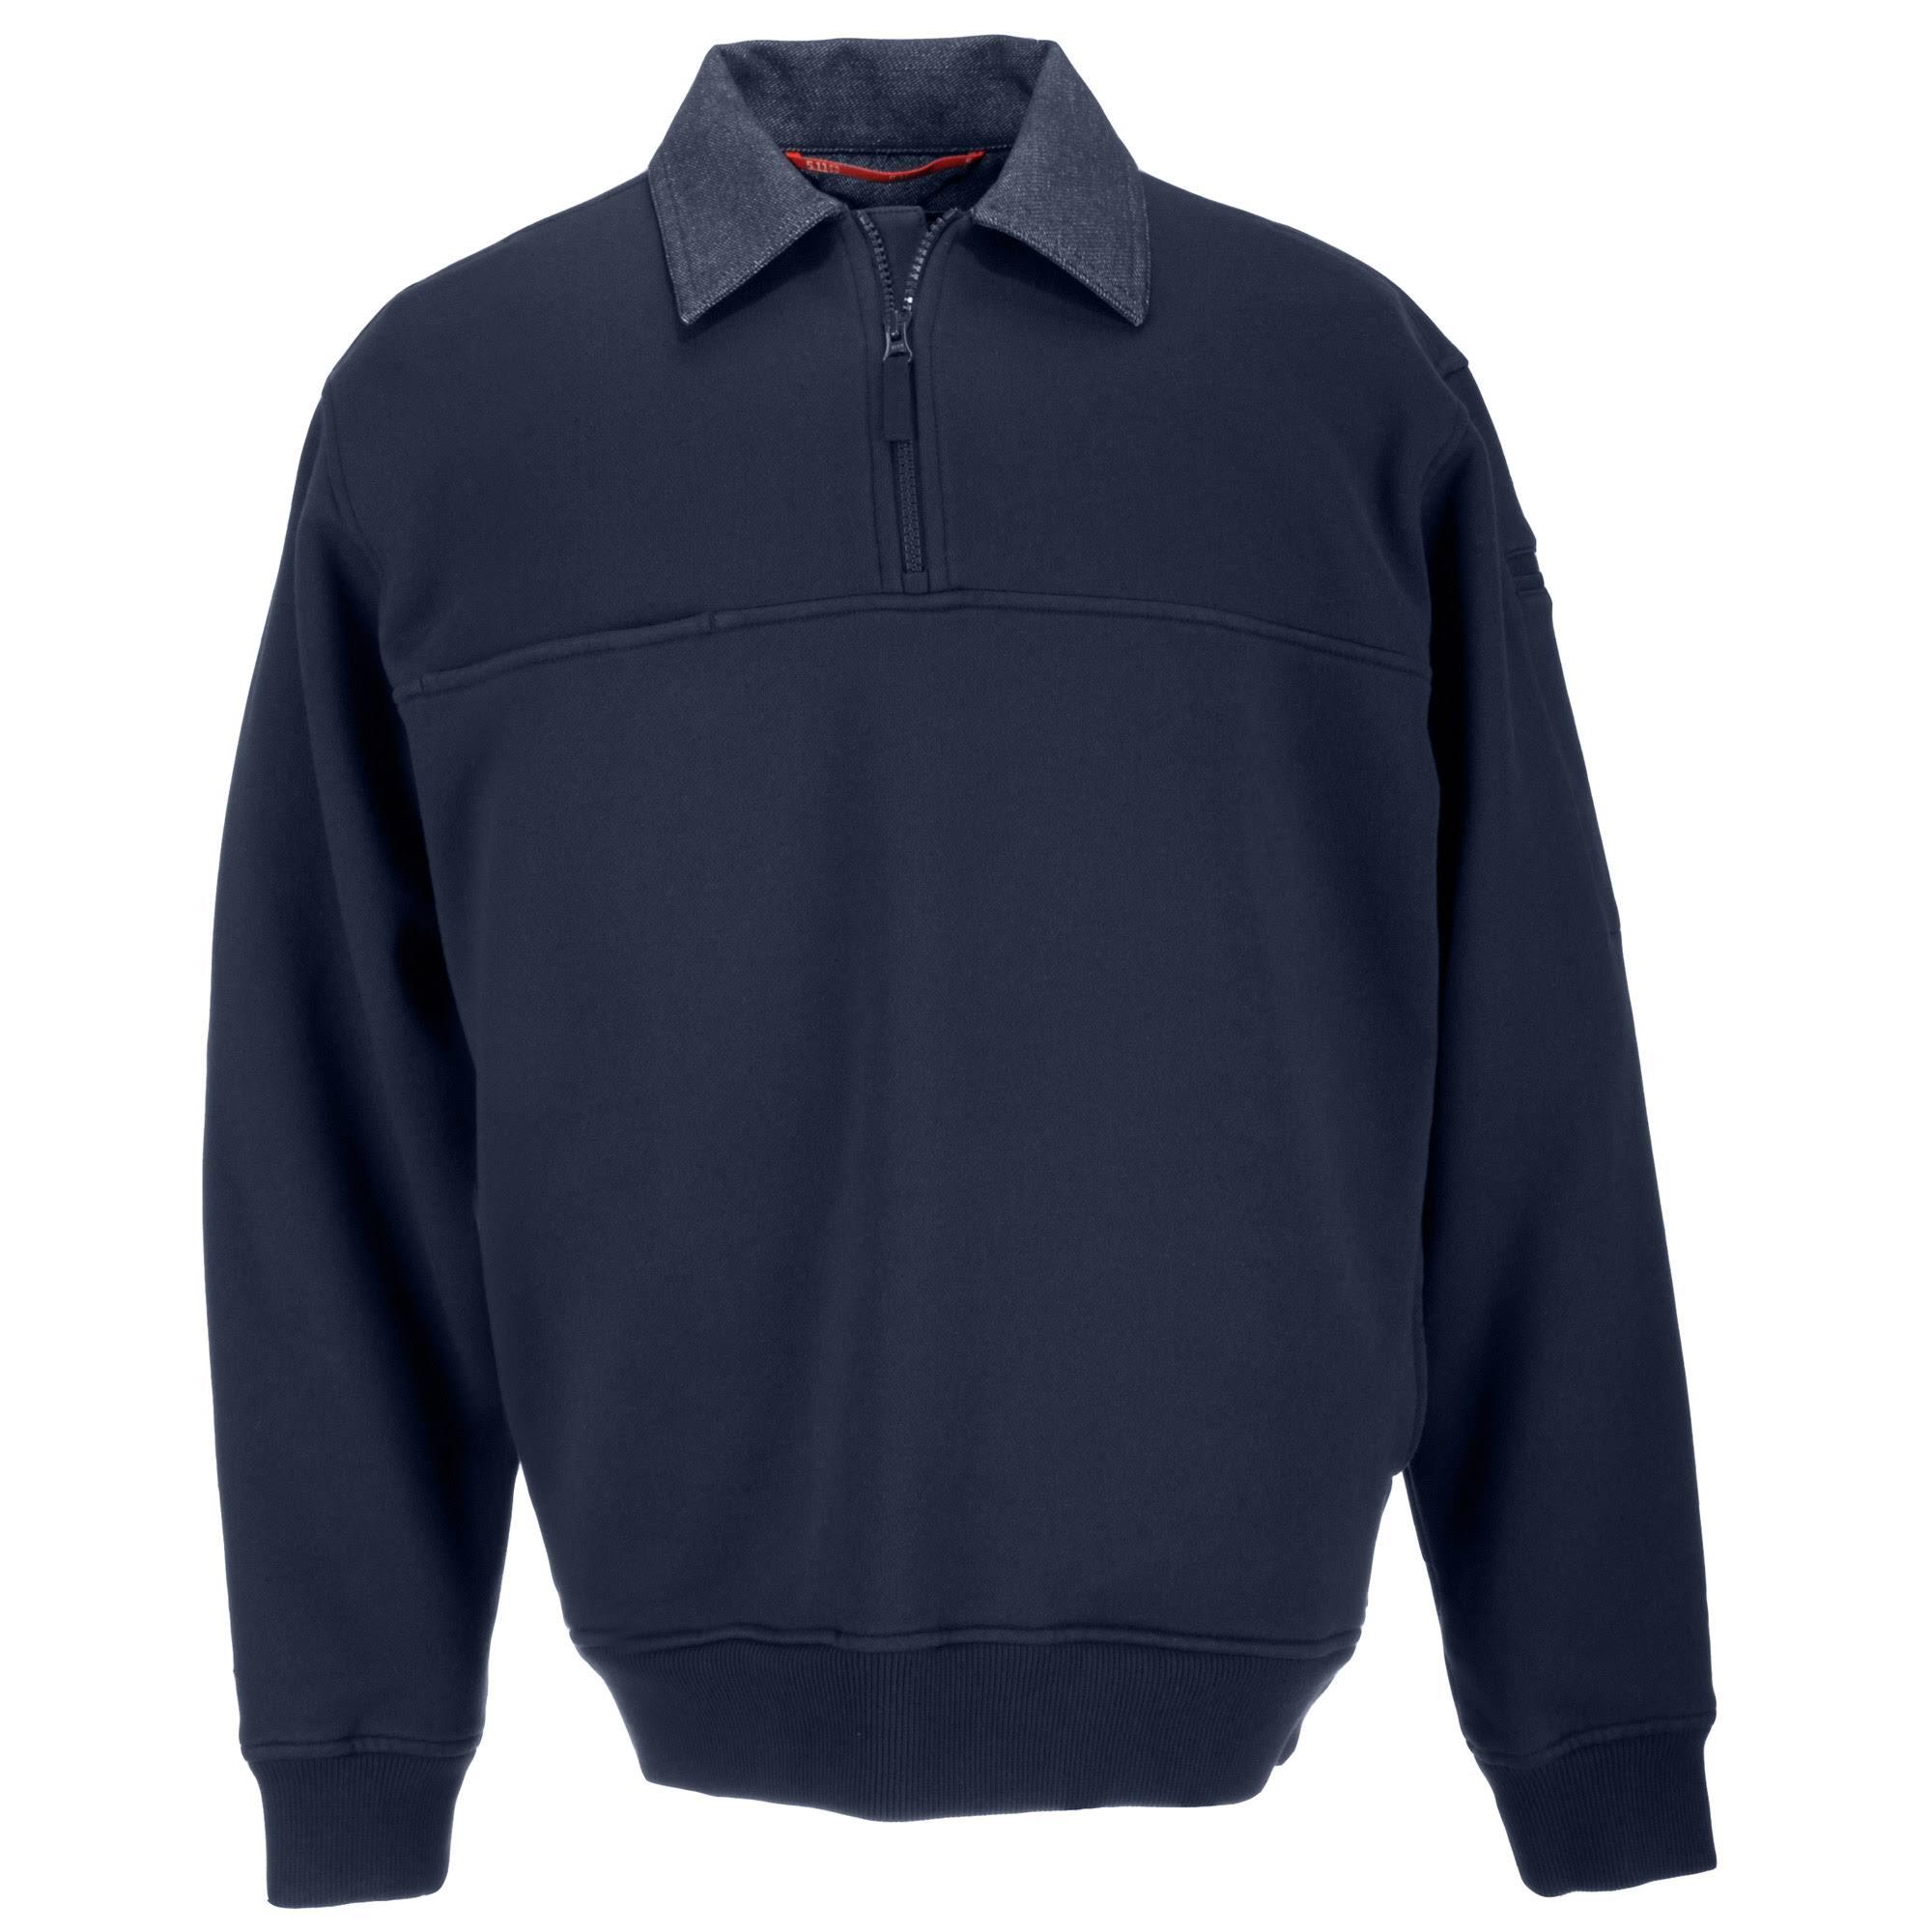 Denim Detalles Trabajo De 11 Con Táctico 5 Camisa qwRZp7xw0P